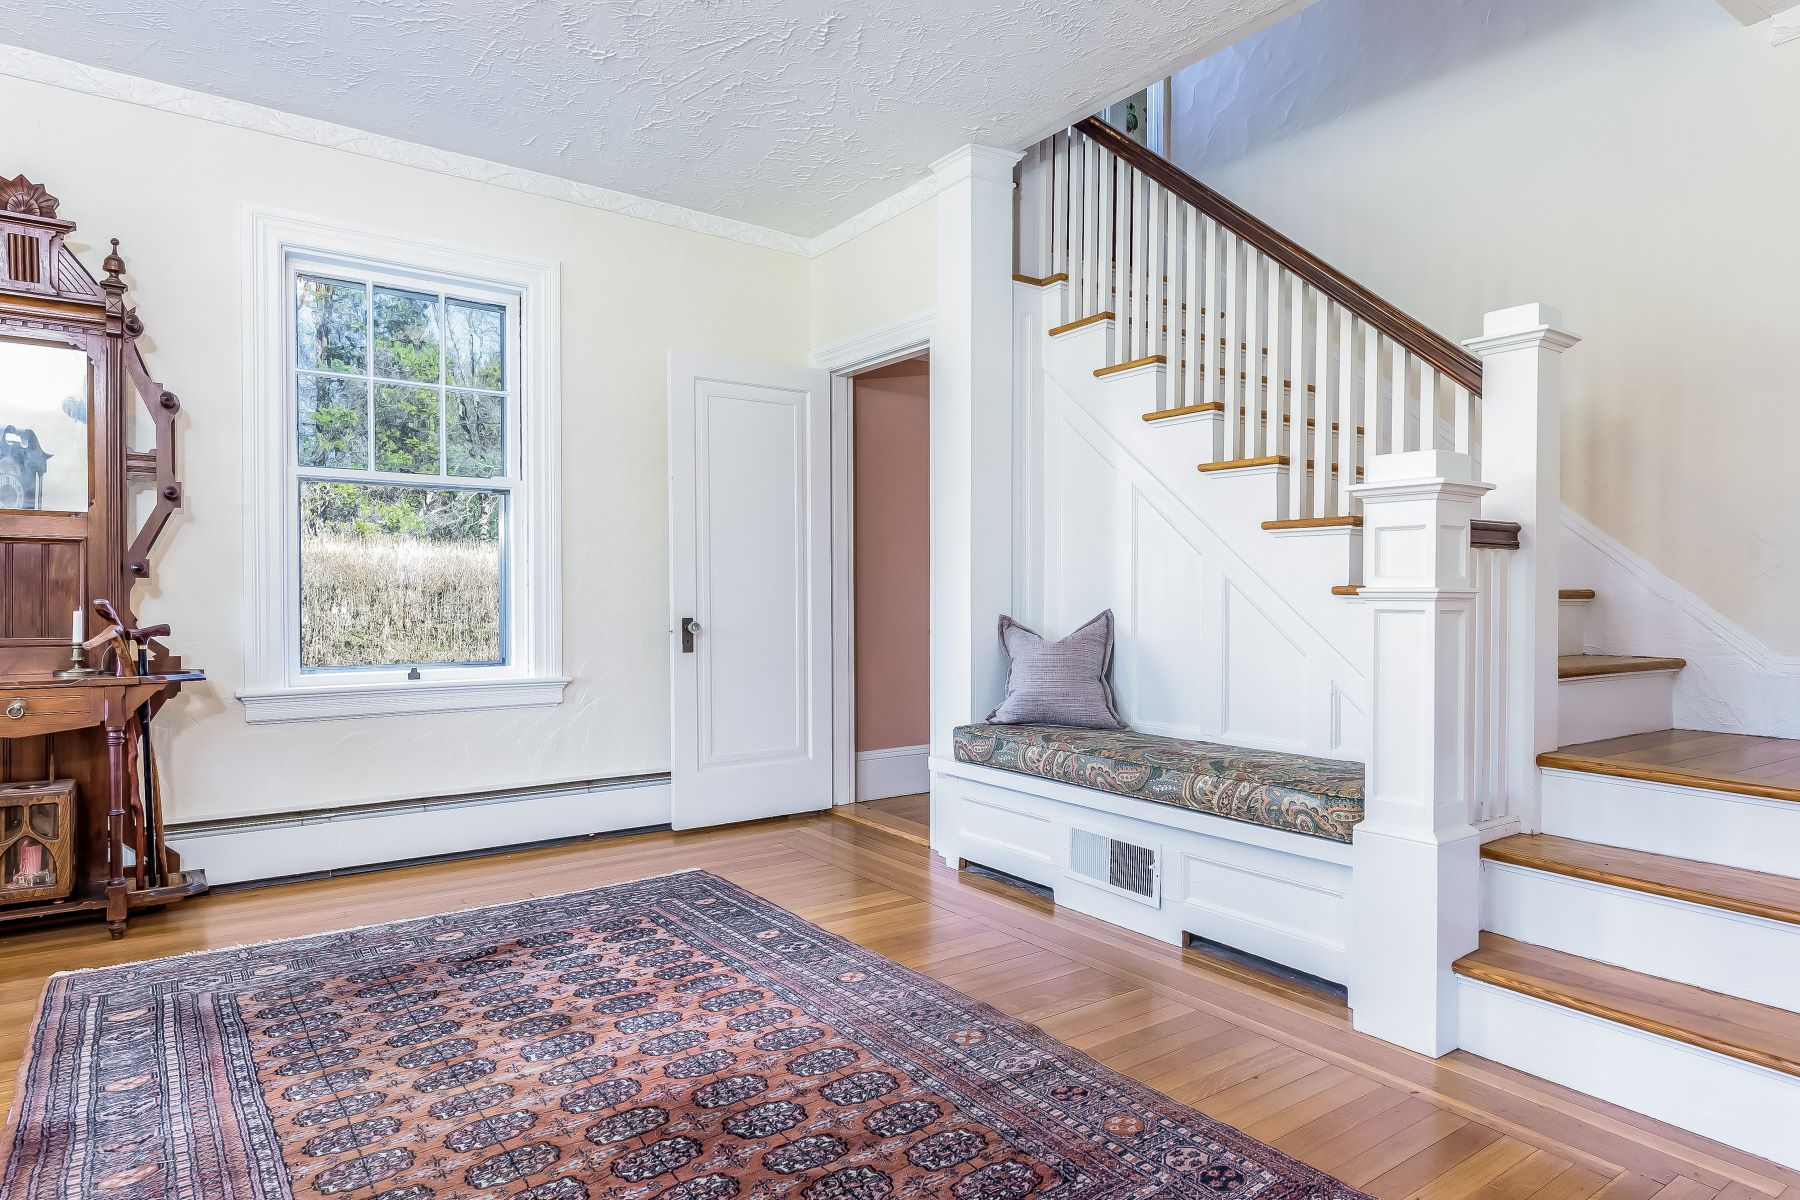 Single Family Homes για την Πώληση στο 54 Kirby Av., Warwick, RI Warwick, Ροουντ Αϊλαντ 02889 Ηνωμένες Πολιτείες